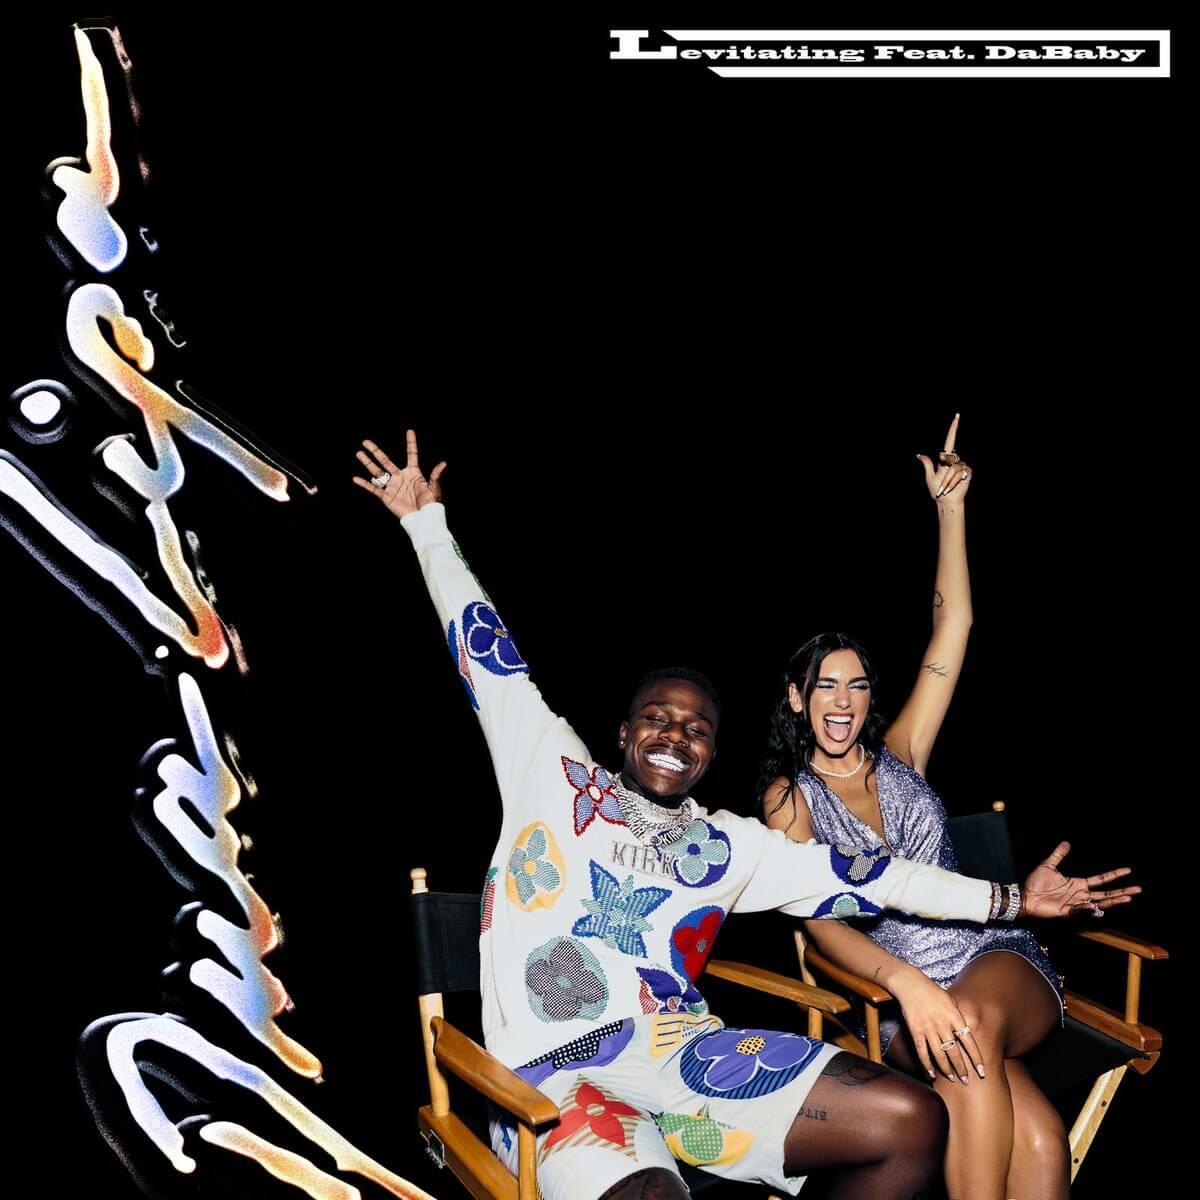 Dua Lipa - Levitating Featuring DaBaby Lyrics